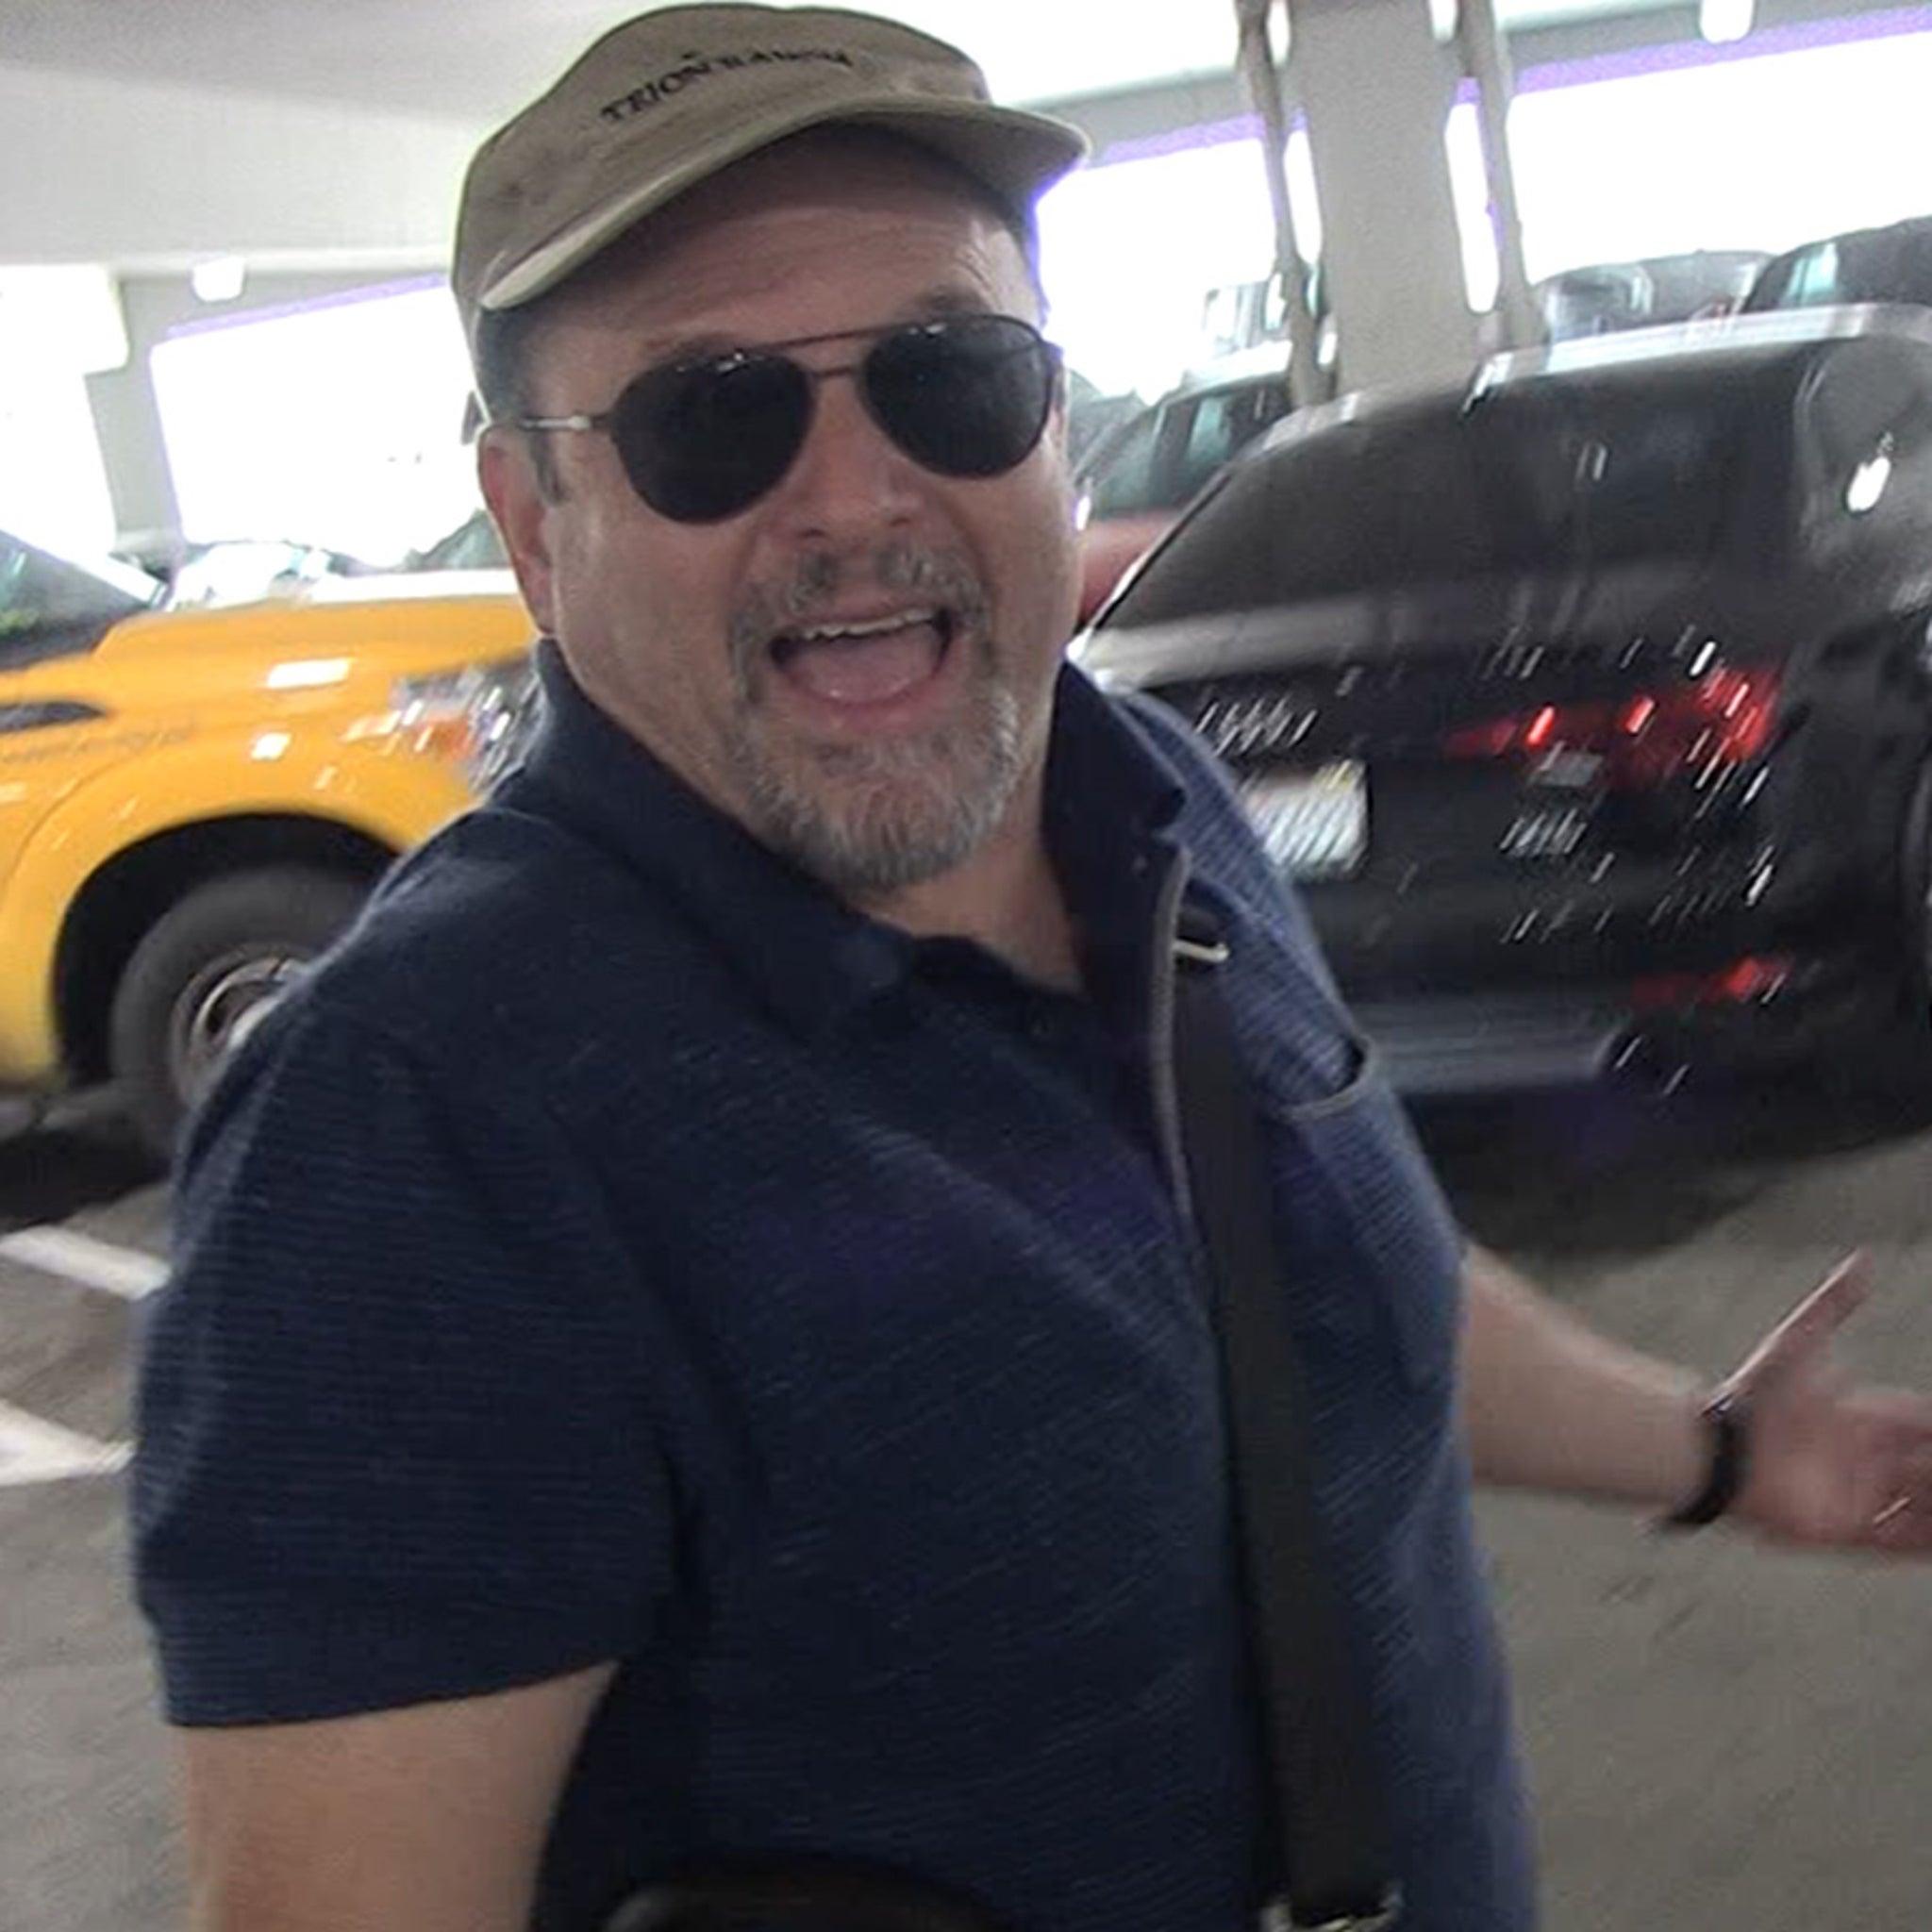 Jason Alexander Weighs In on Bidding War for 'Seinfeld' Post-Hulu